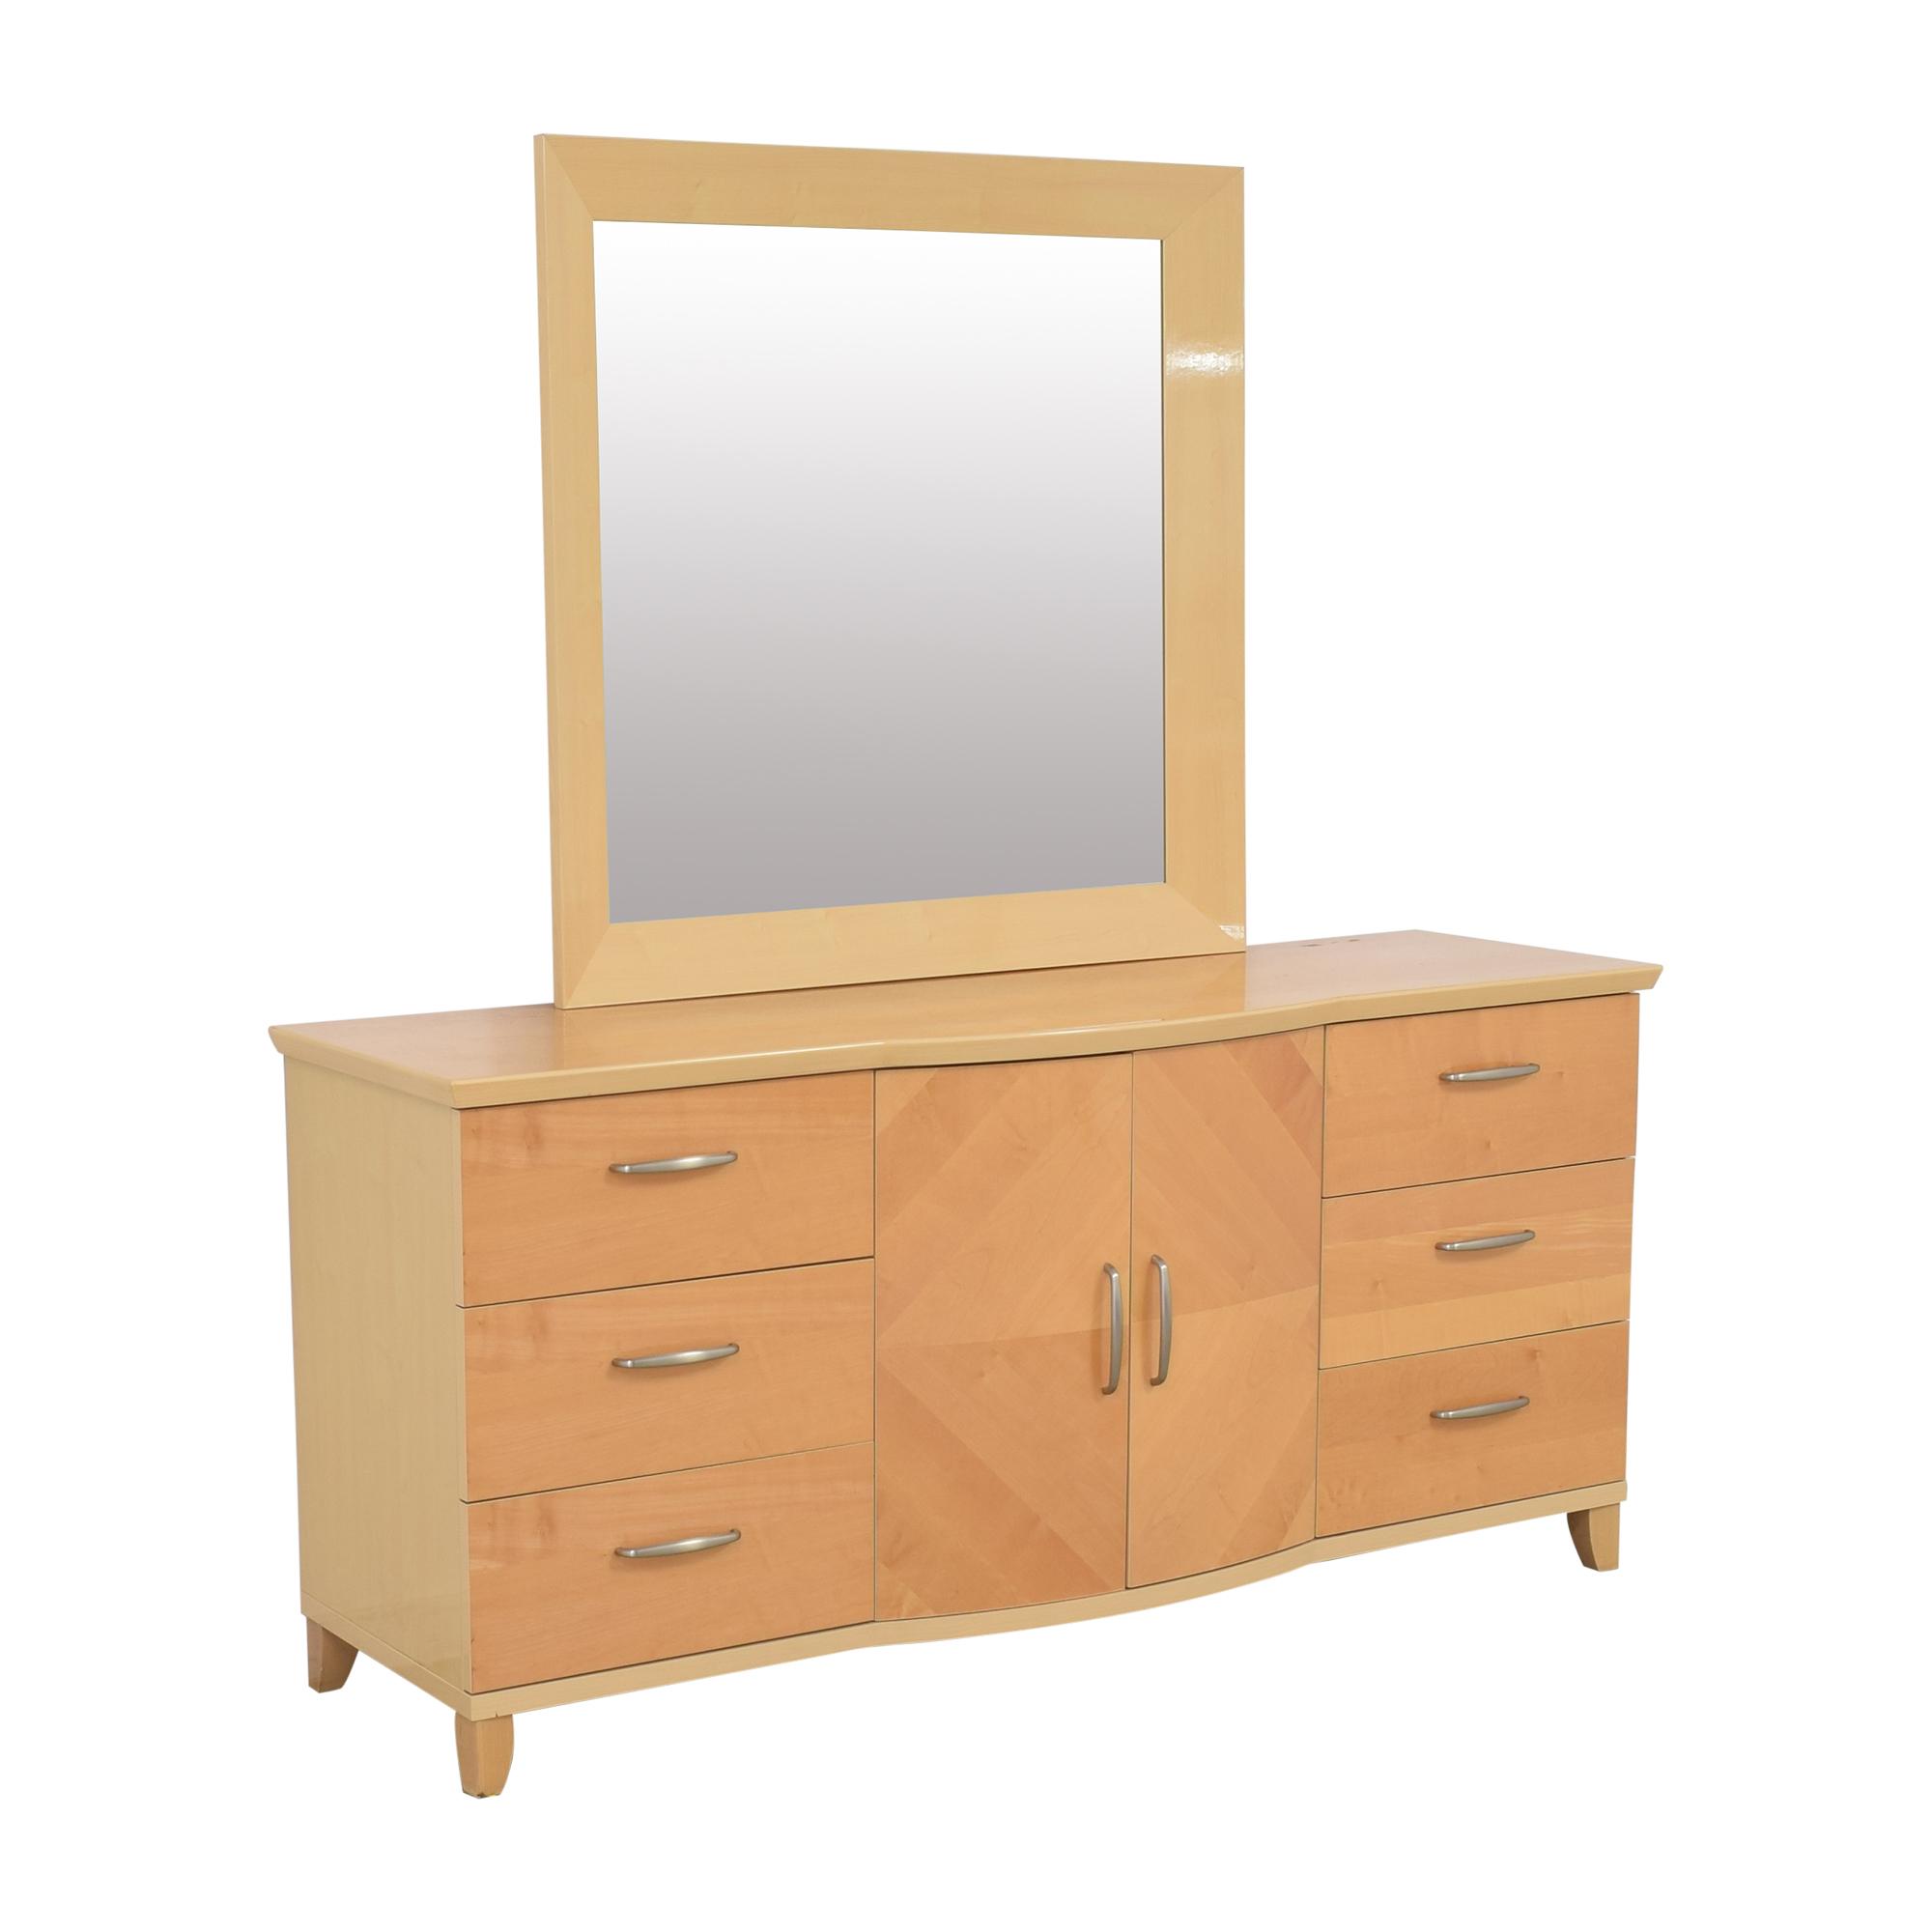 shop Planum Modern Style Dresser and Mirror Planum Storage